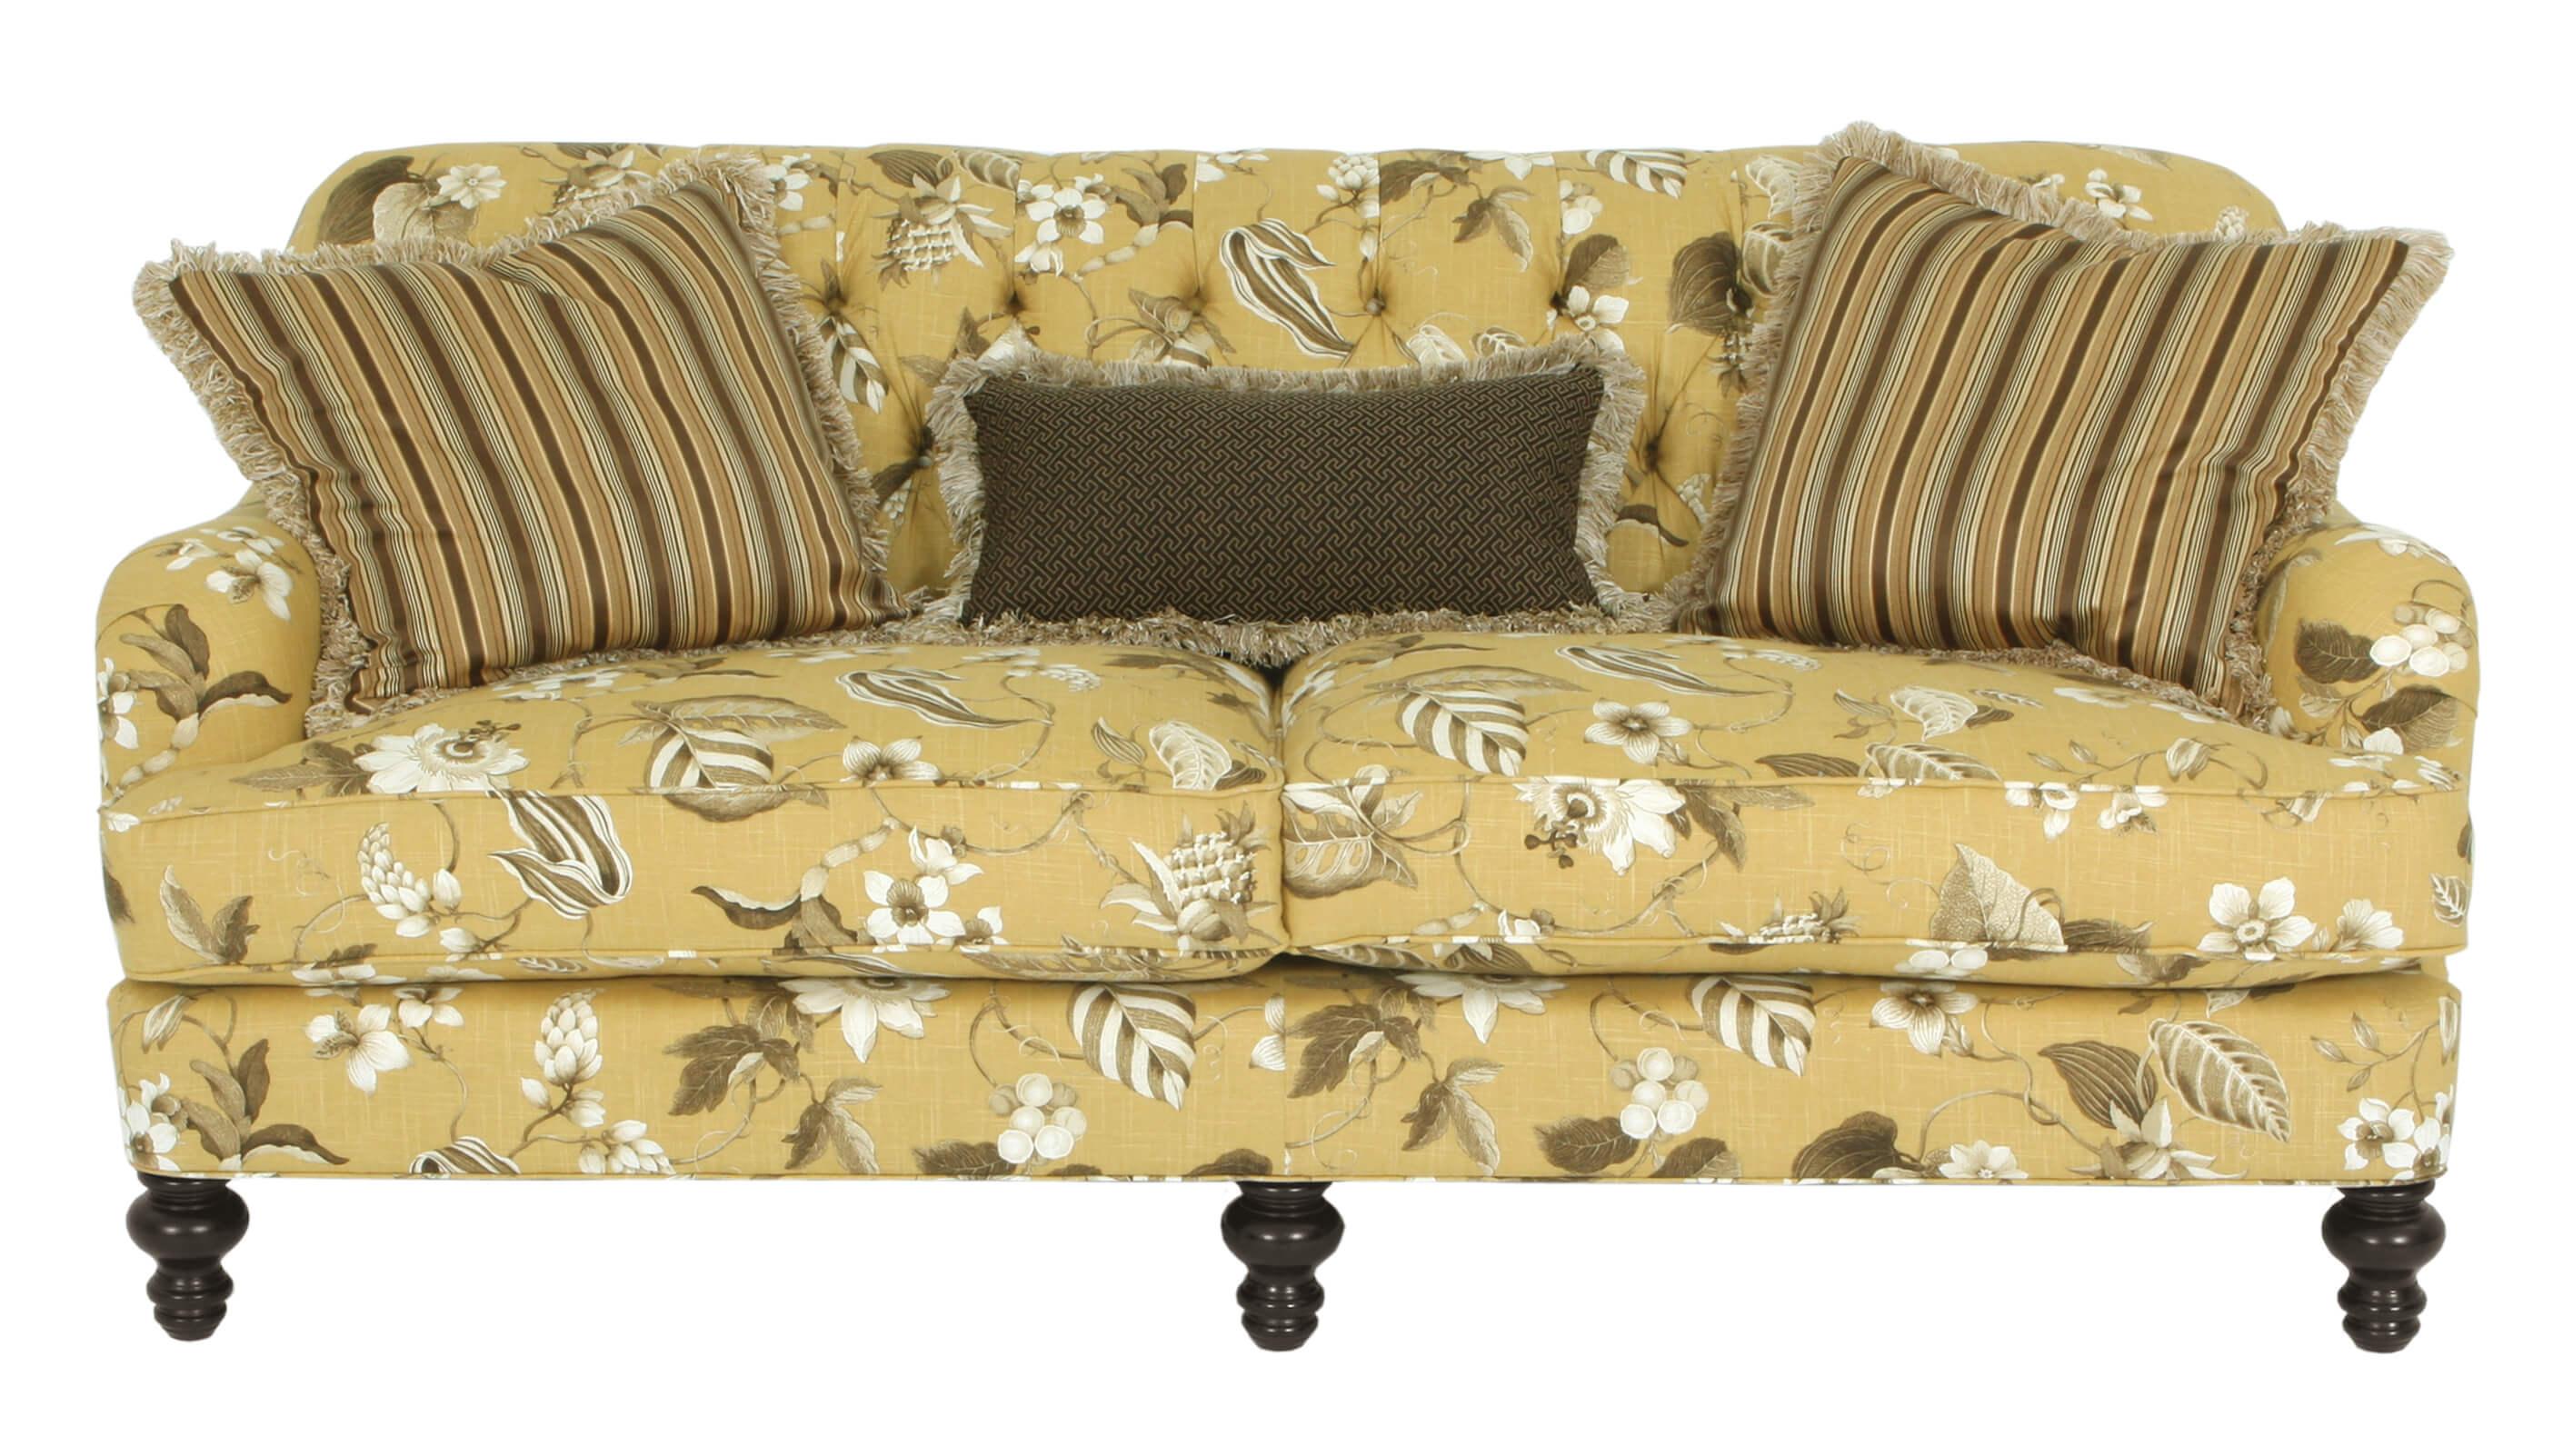 Melanie 865-70 sofa_New Classic